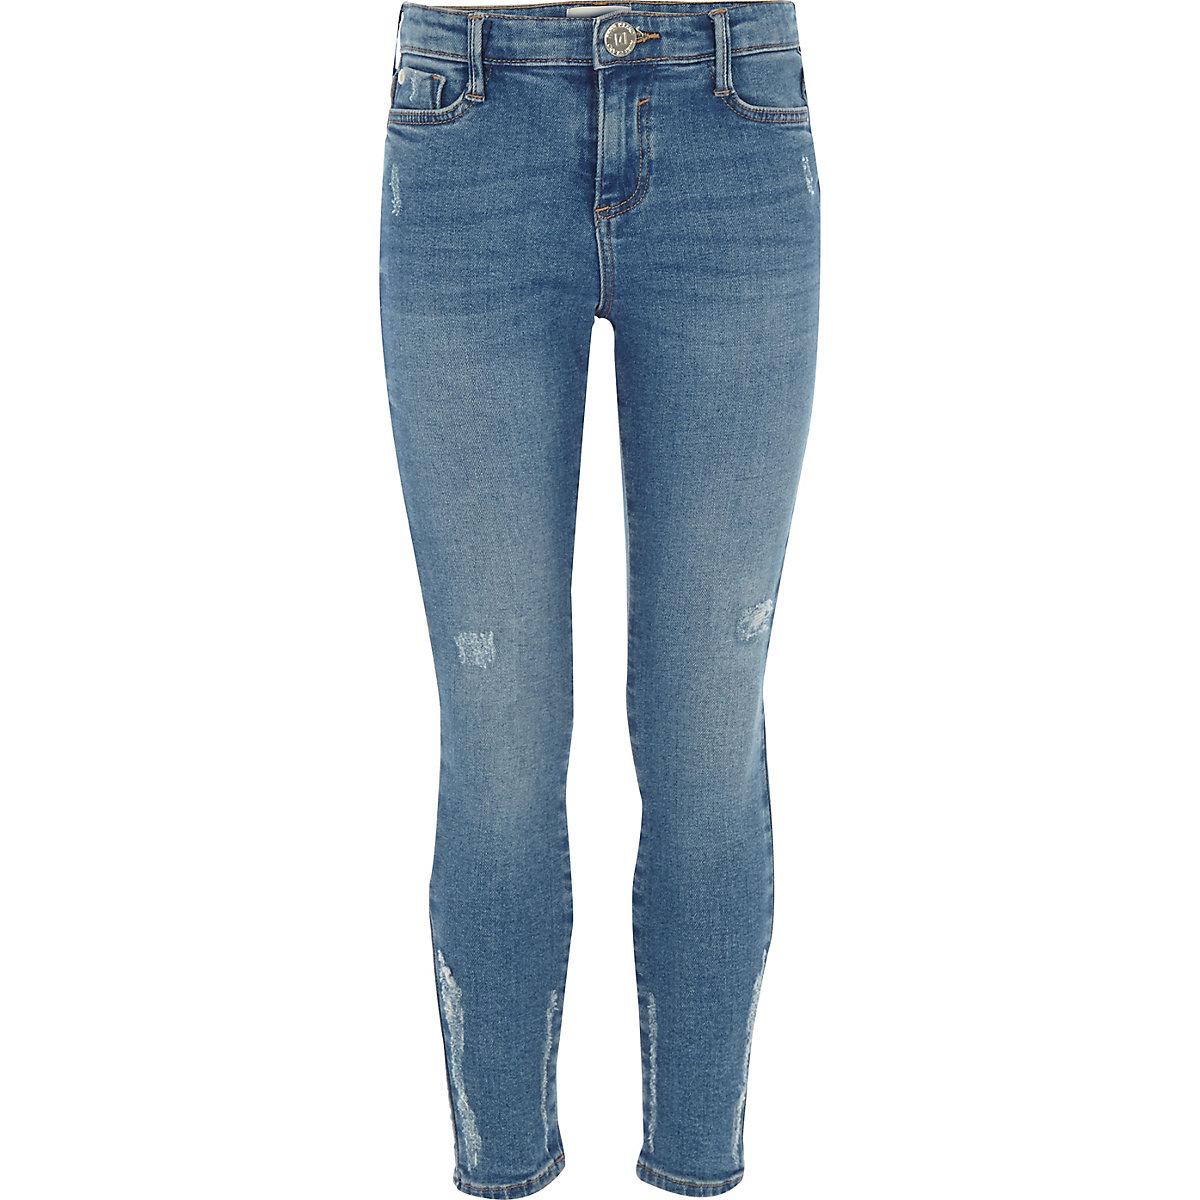 Girls blue wash Amelie distressed jeans